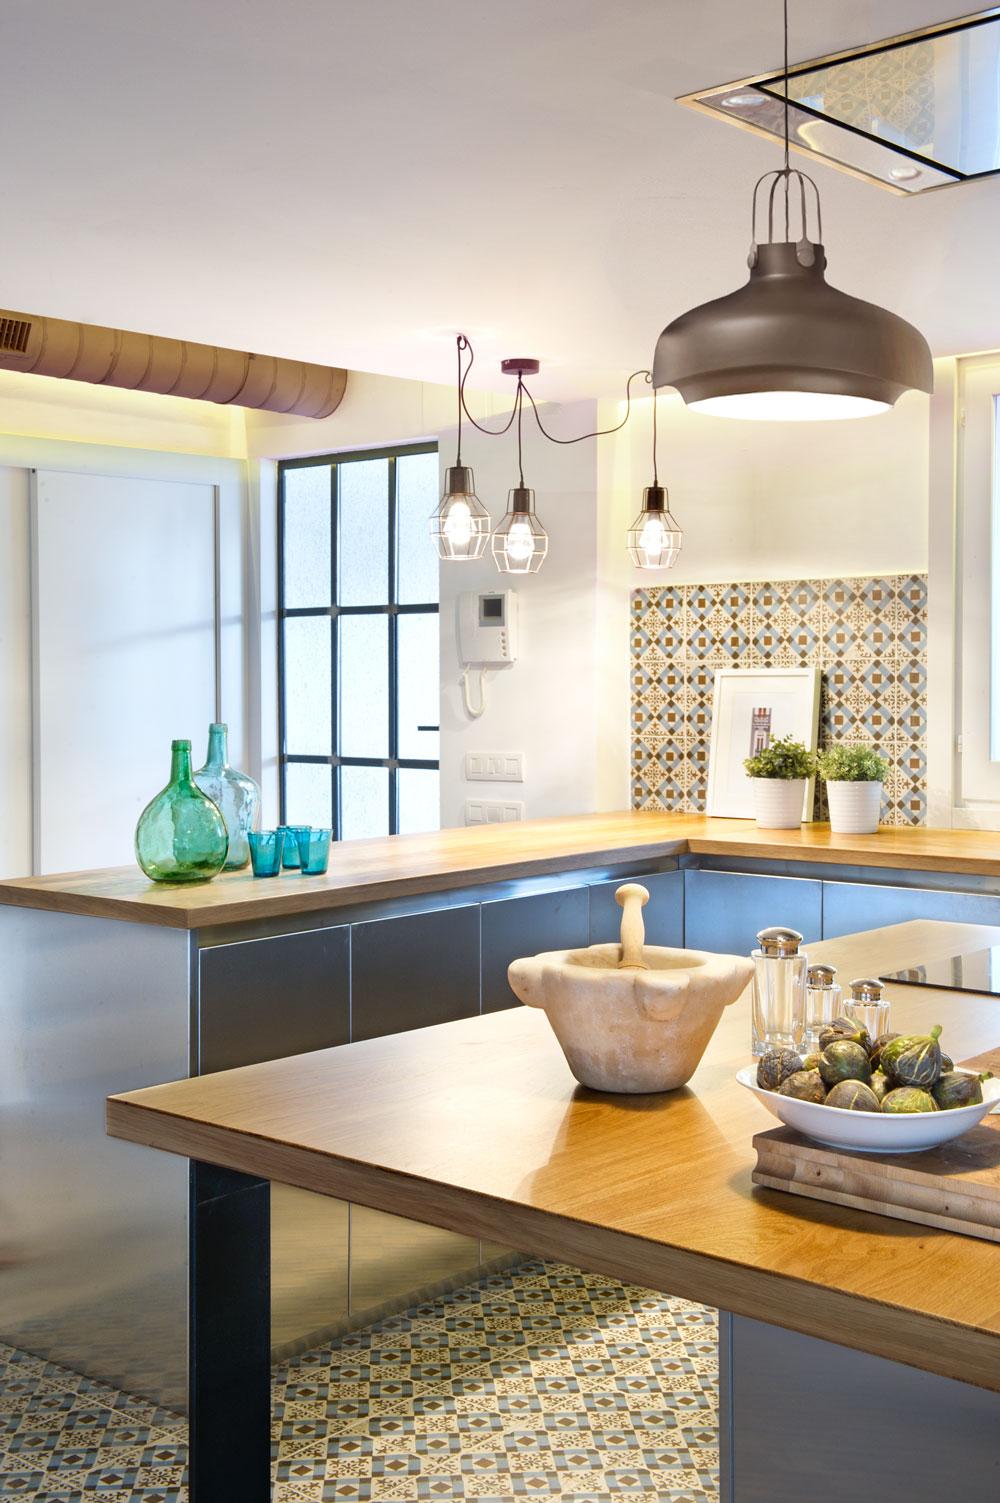 suspension industrielle cuisine inox et bois. Black Bedroom Furniture Sets. Home Design Ideas